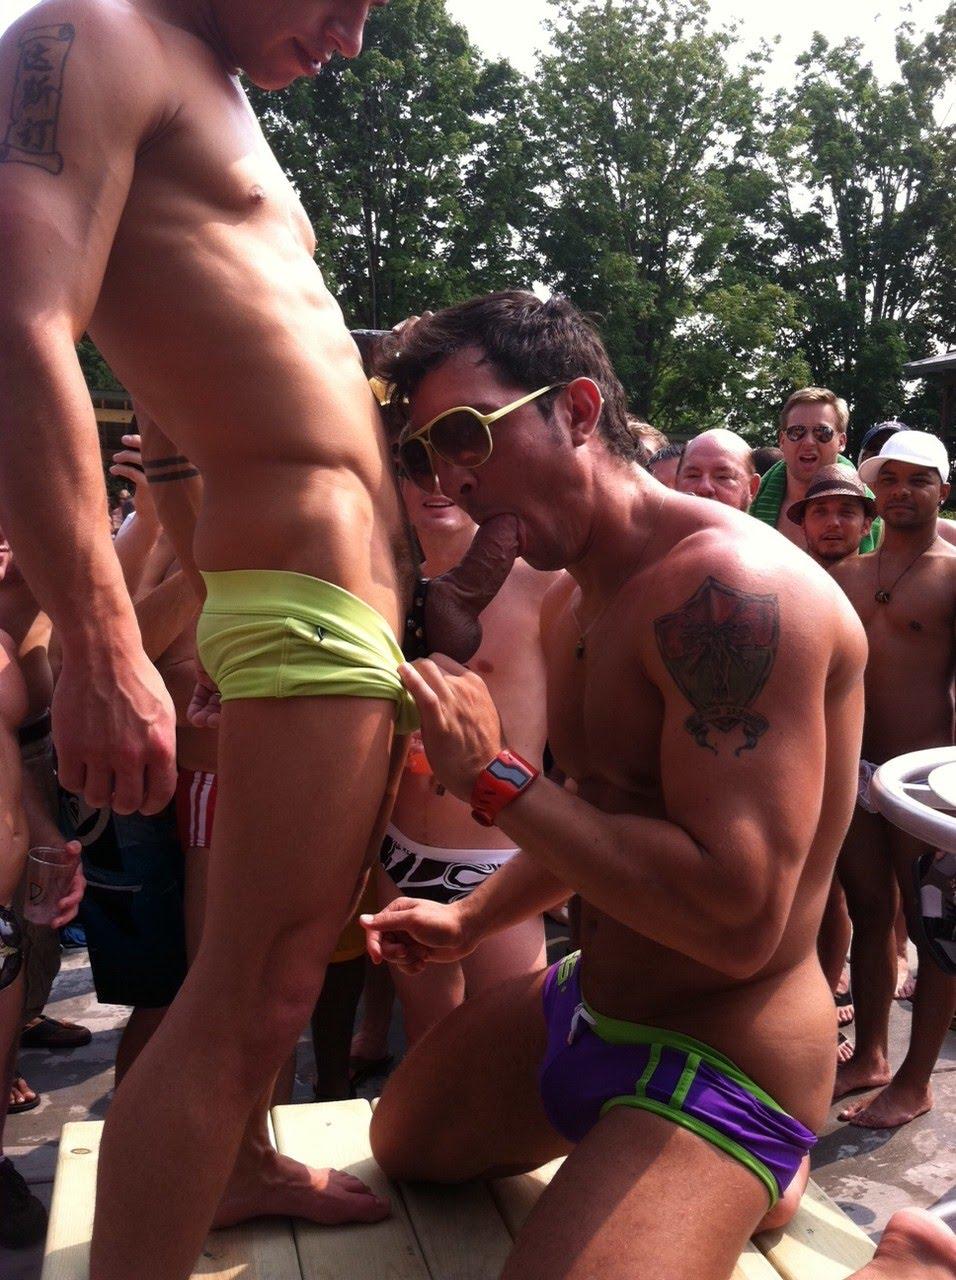 Dani bulging fetish in man shorts site while fuck